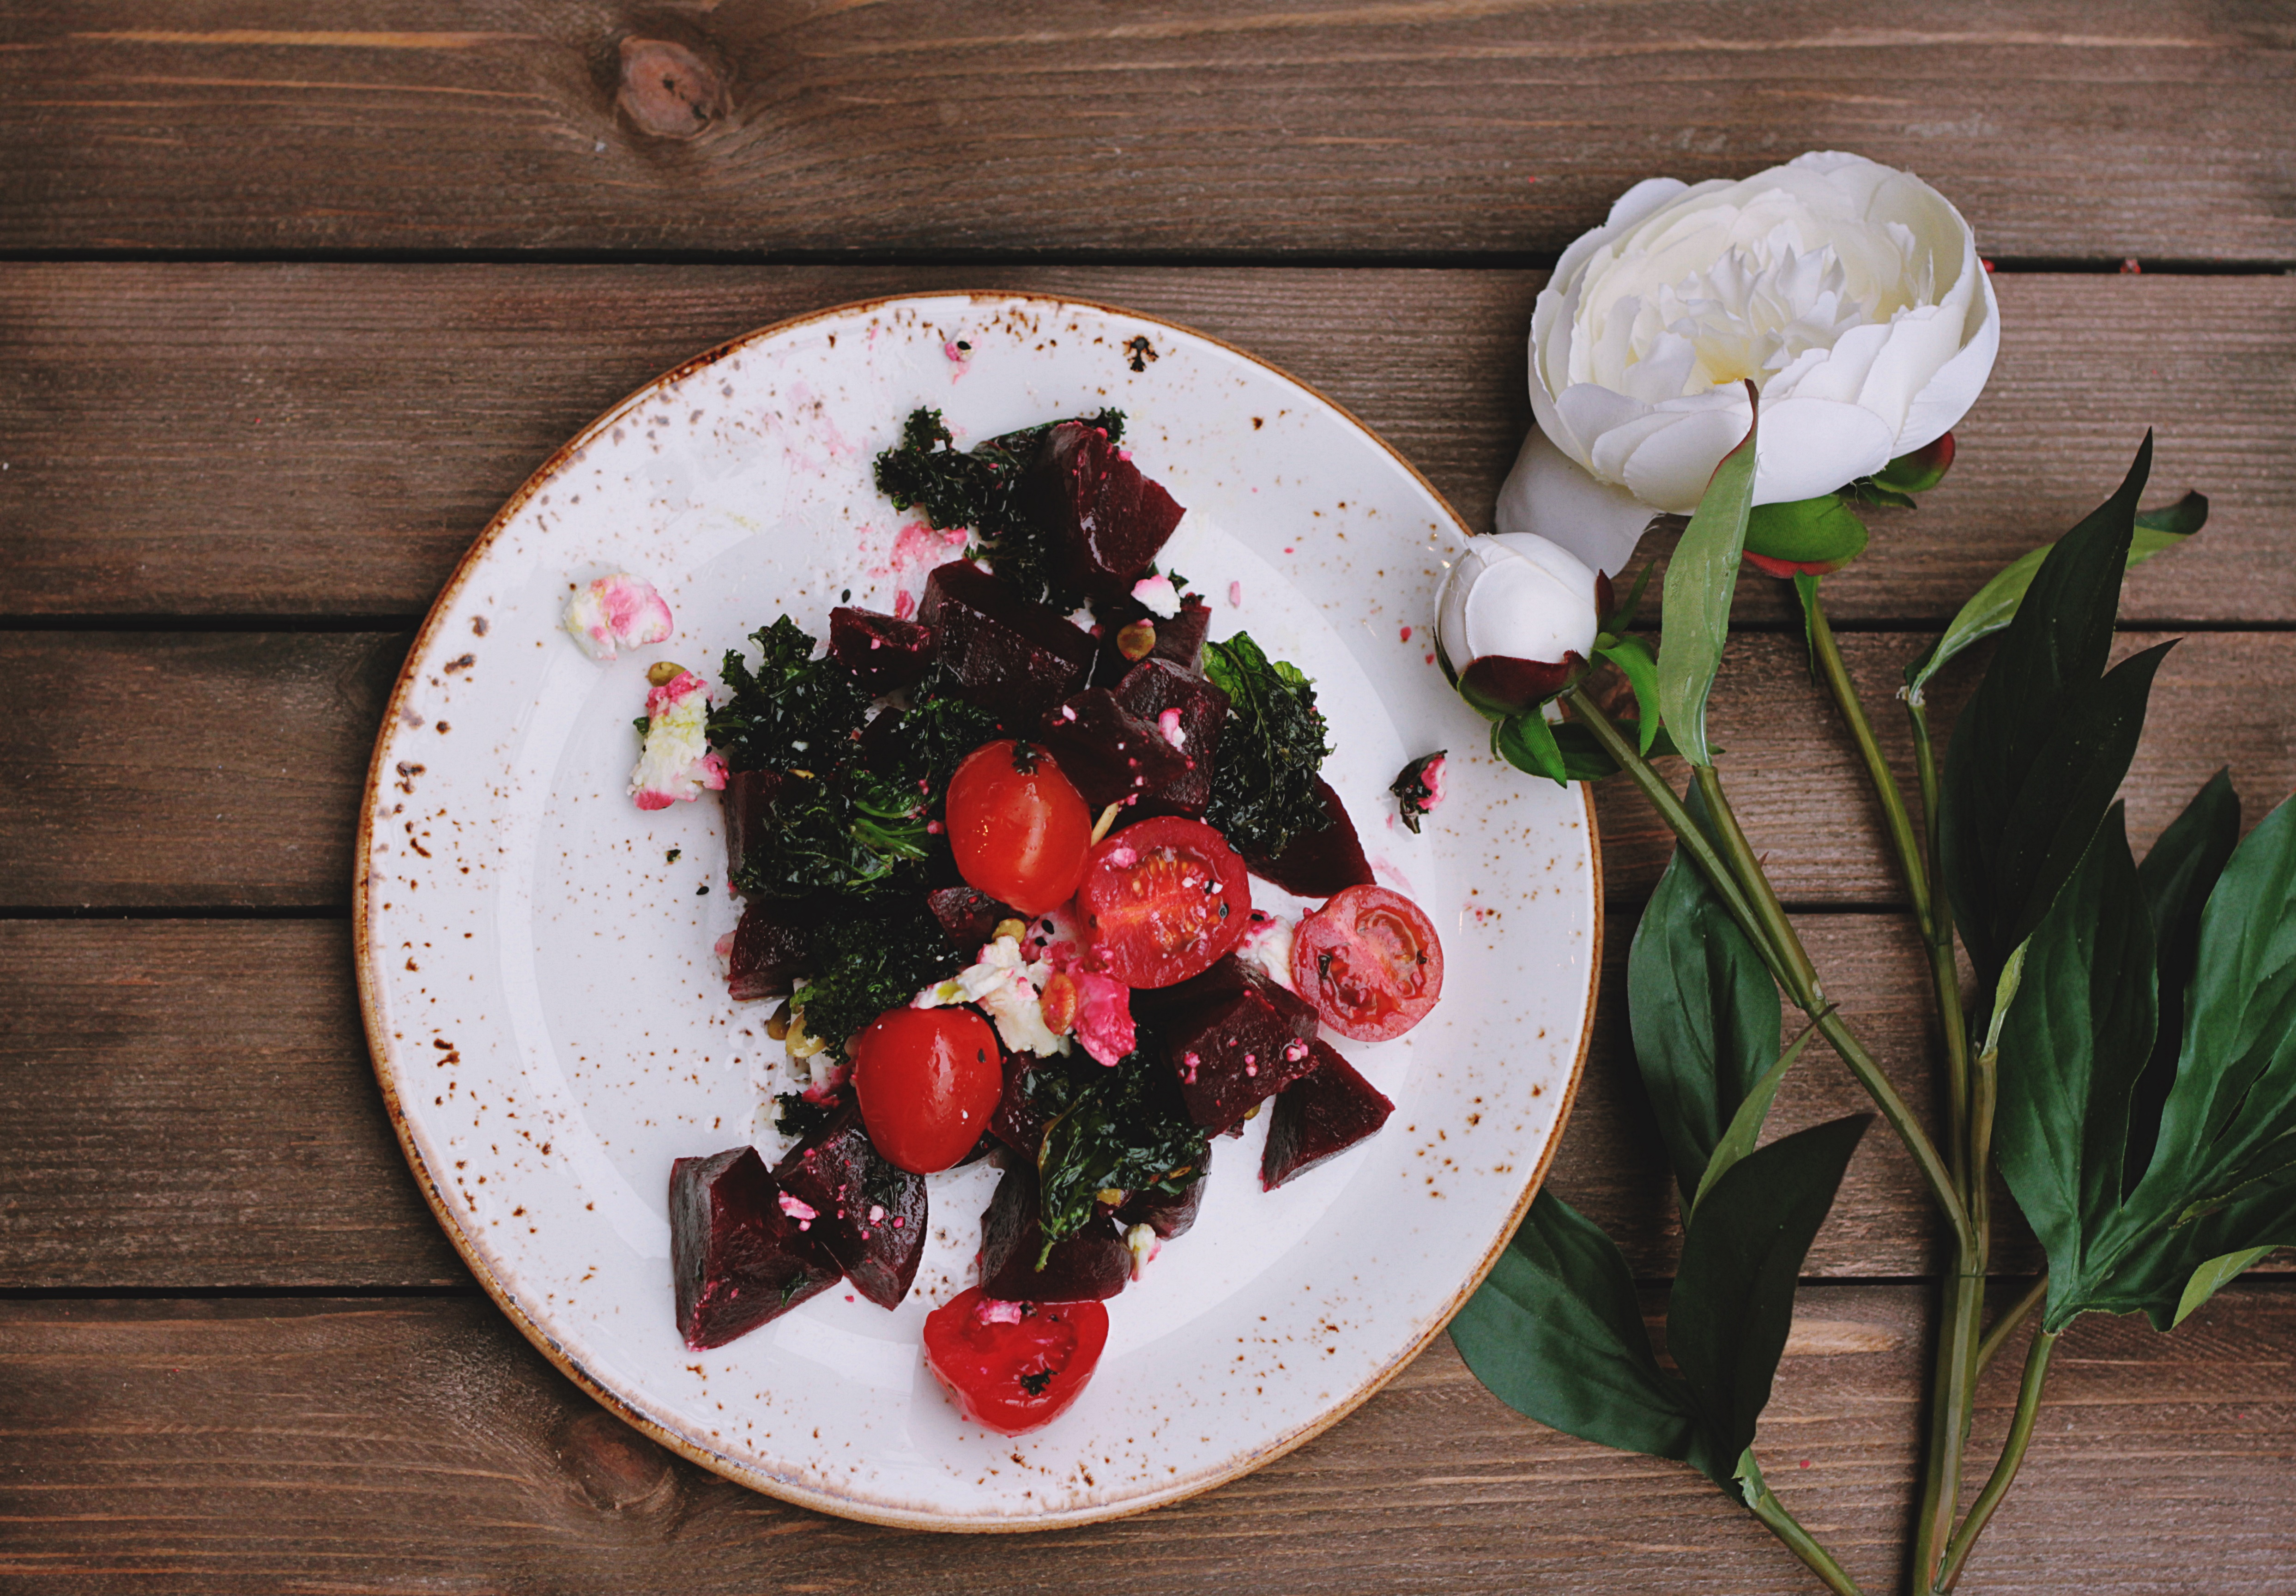 Succulent, flower, purple and art - HD photo by Tina Floersch (@tfloersch) on Unsplash - 웹